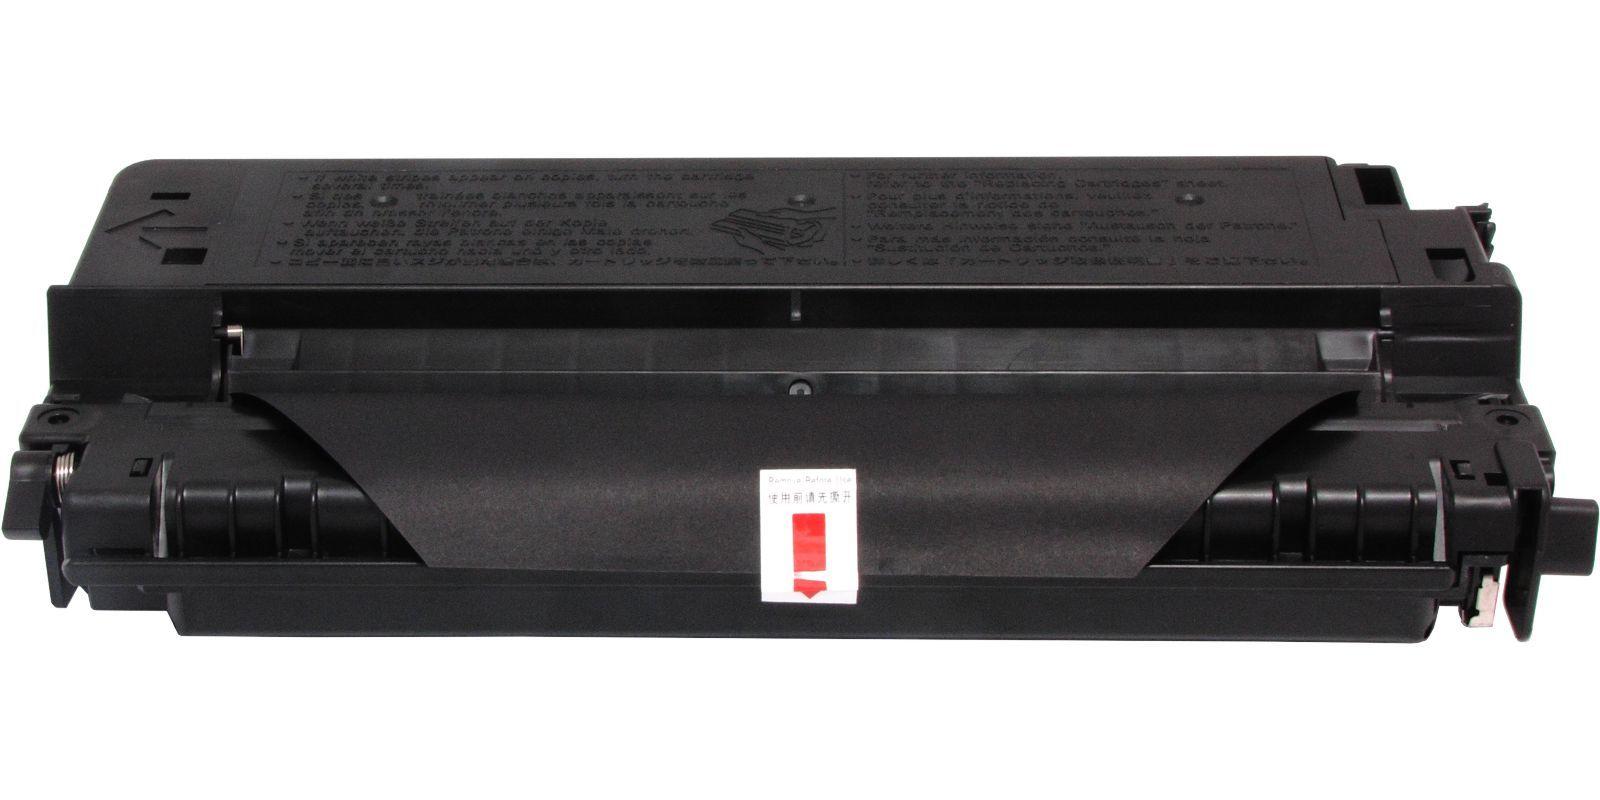 MAK E16/E31-E40/E30-E20 черный, для Canon, до 2000 стр.